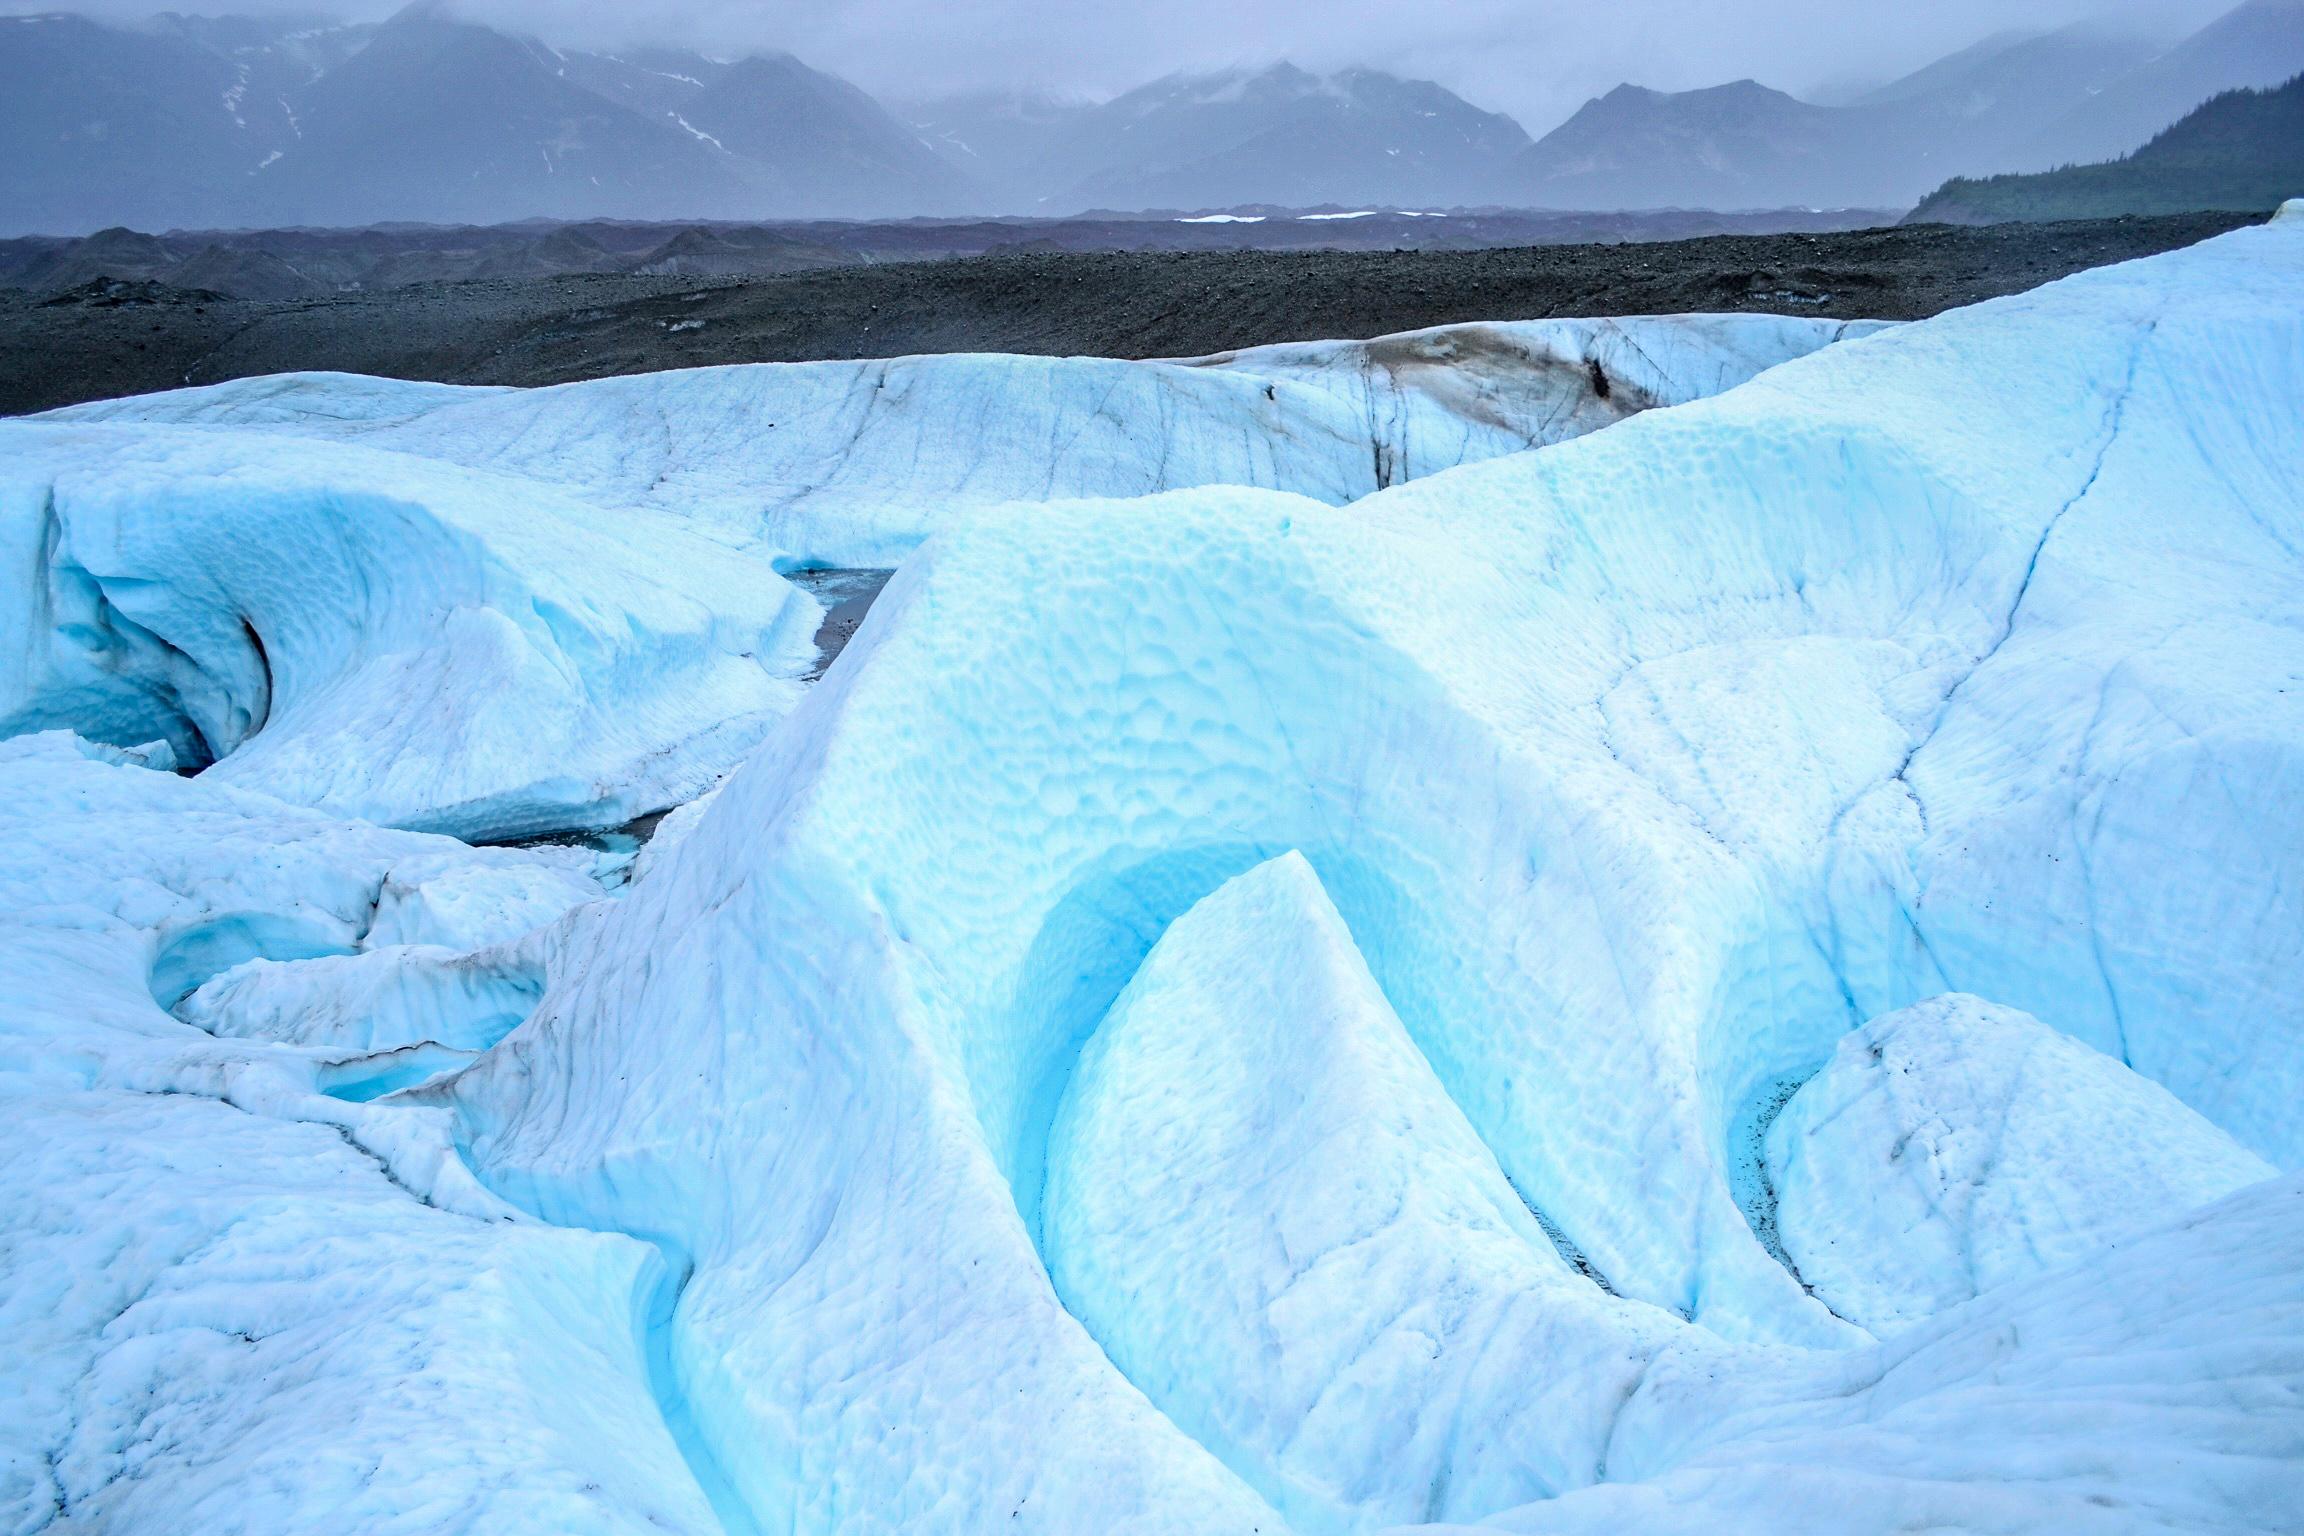 Glacier Adventure Day-Trip: River on the Root Glacier